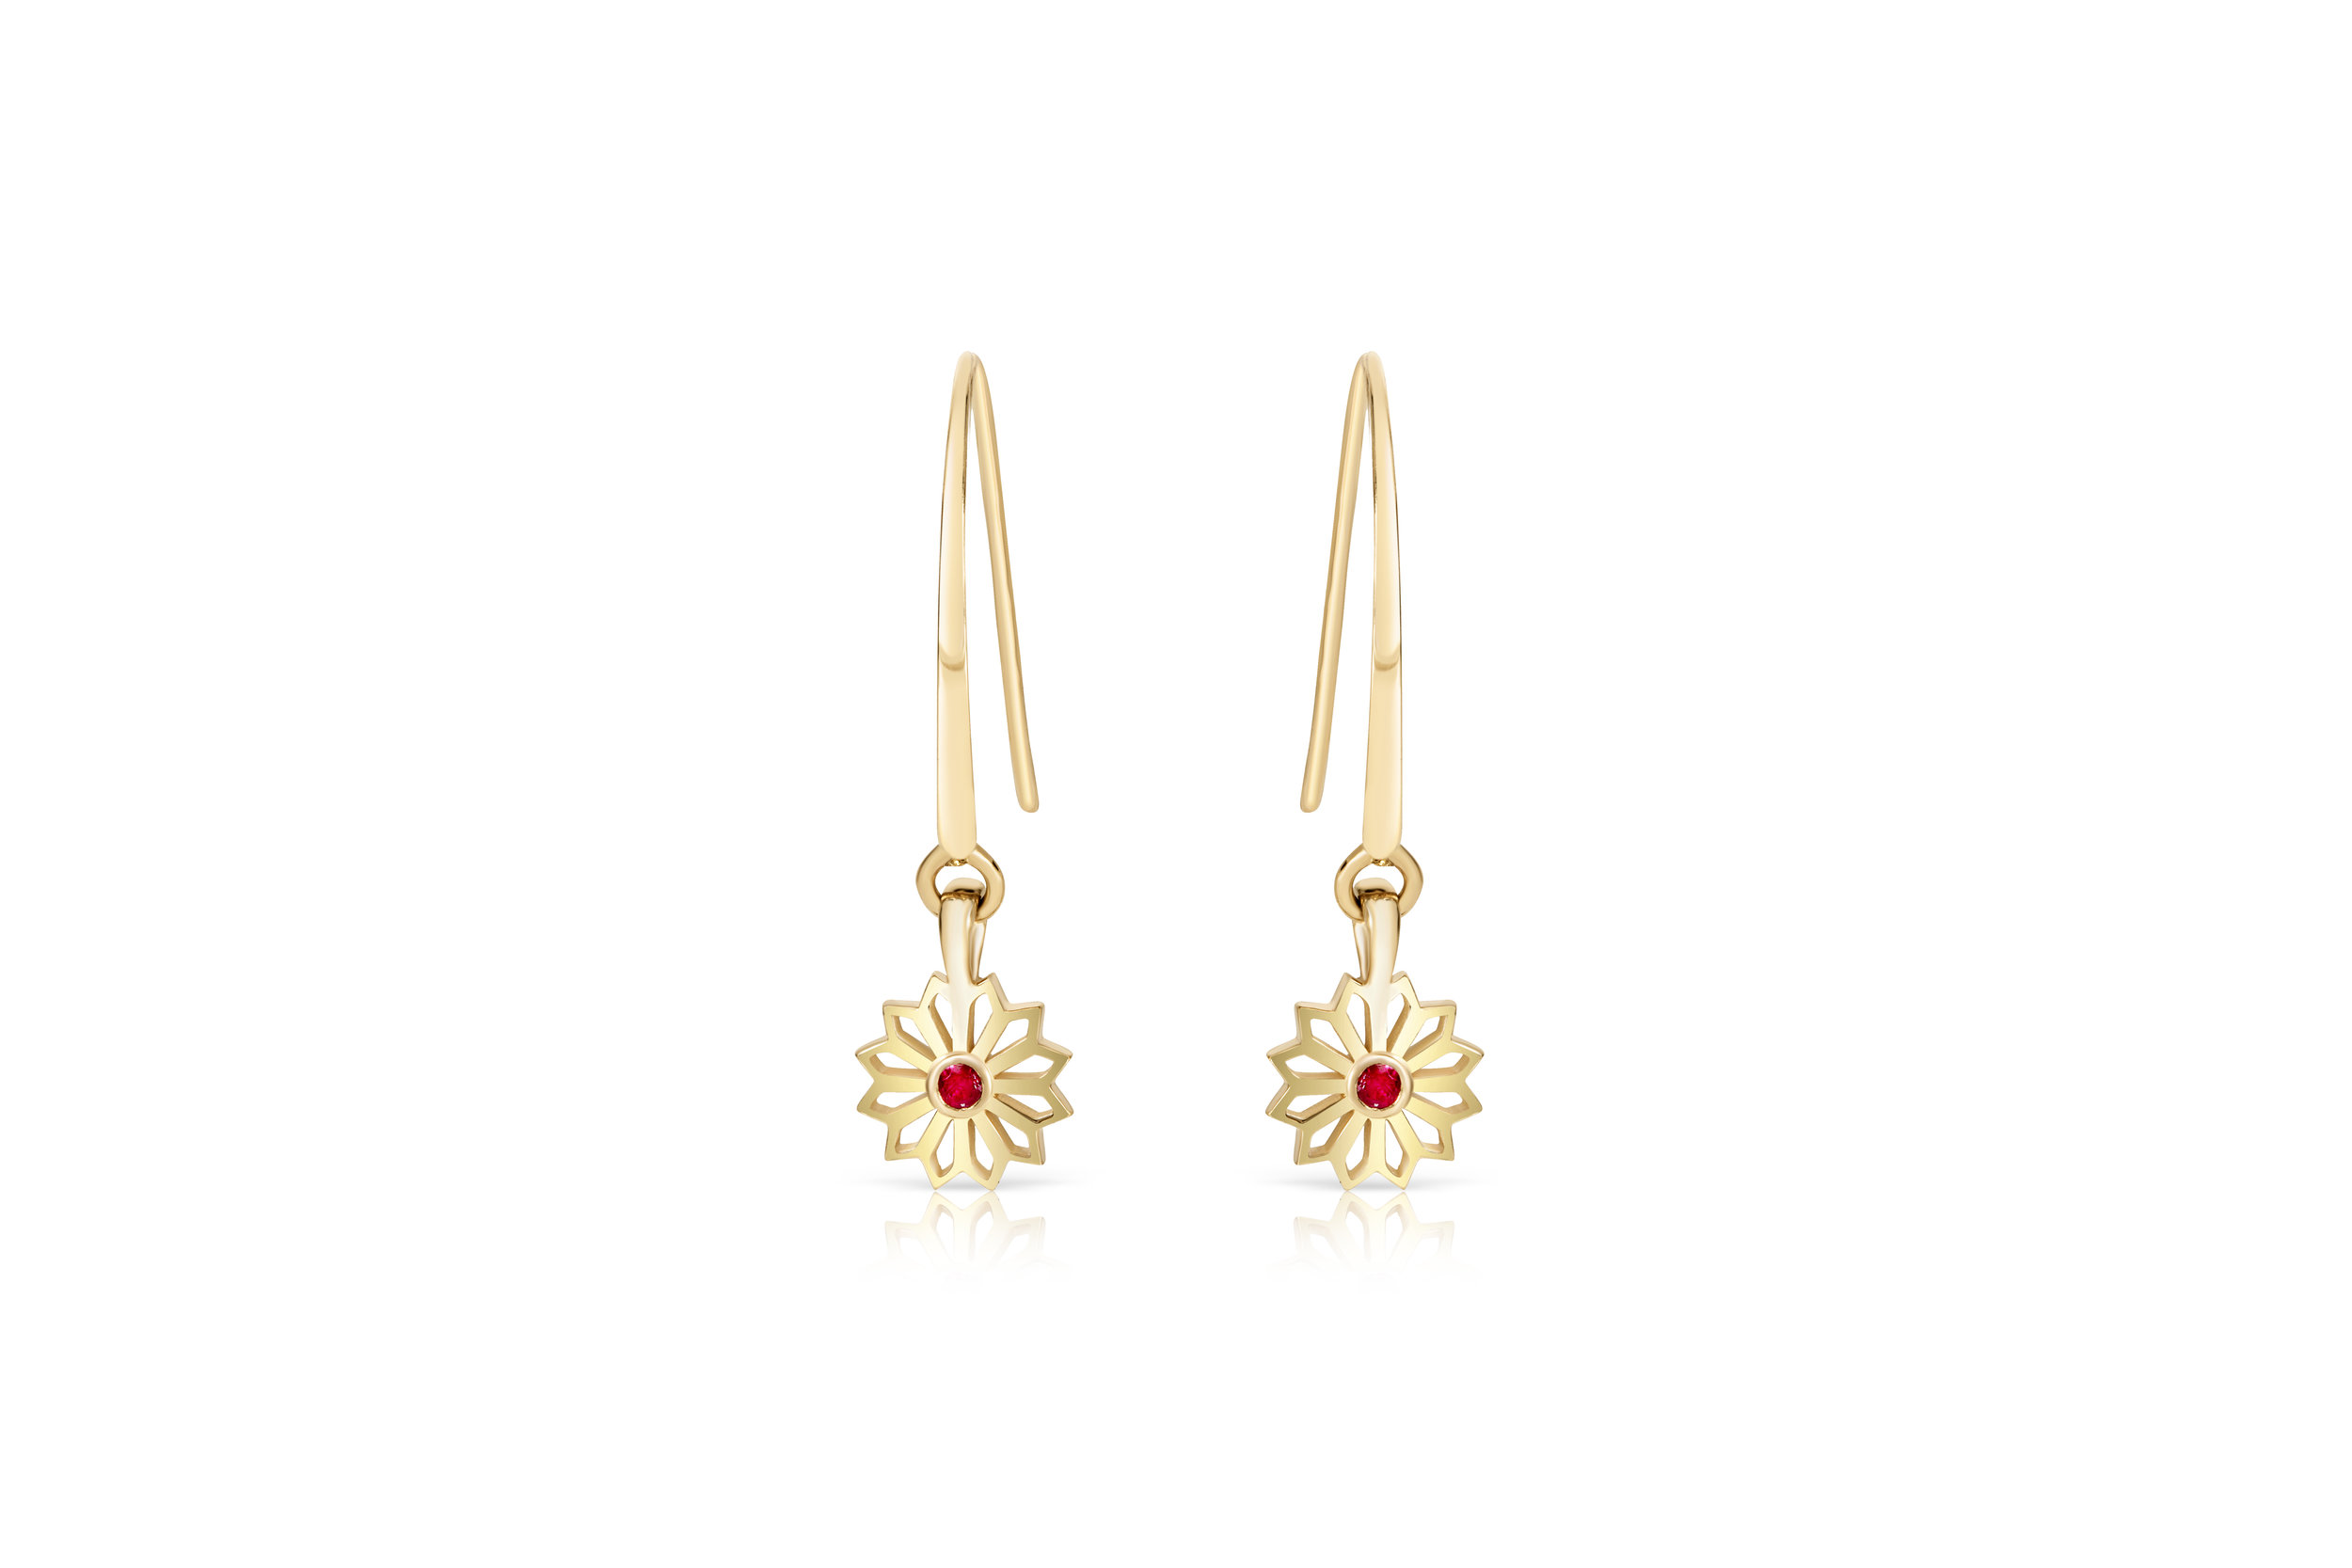 Flora Bhattachary Fine Jewellery Pushpa Drop Star Earrings Thin.jpg